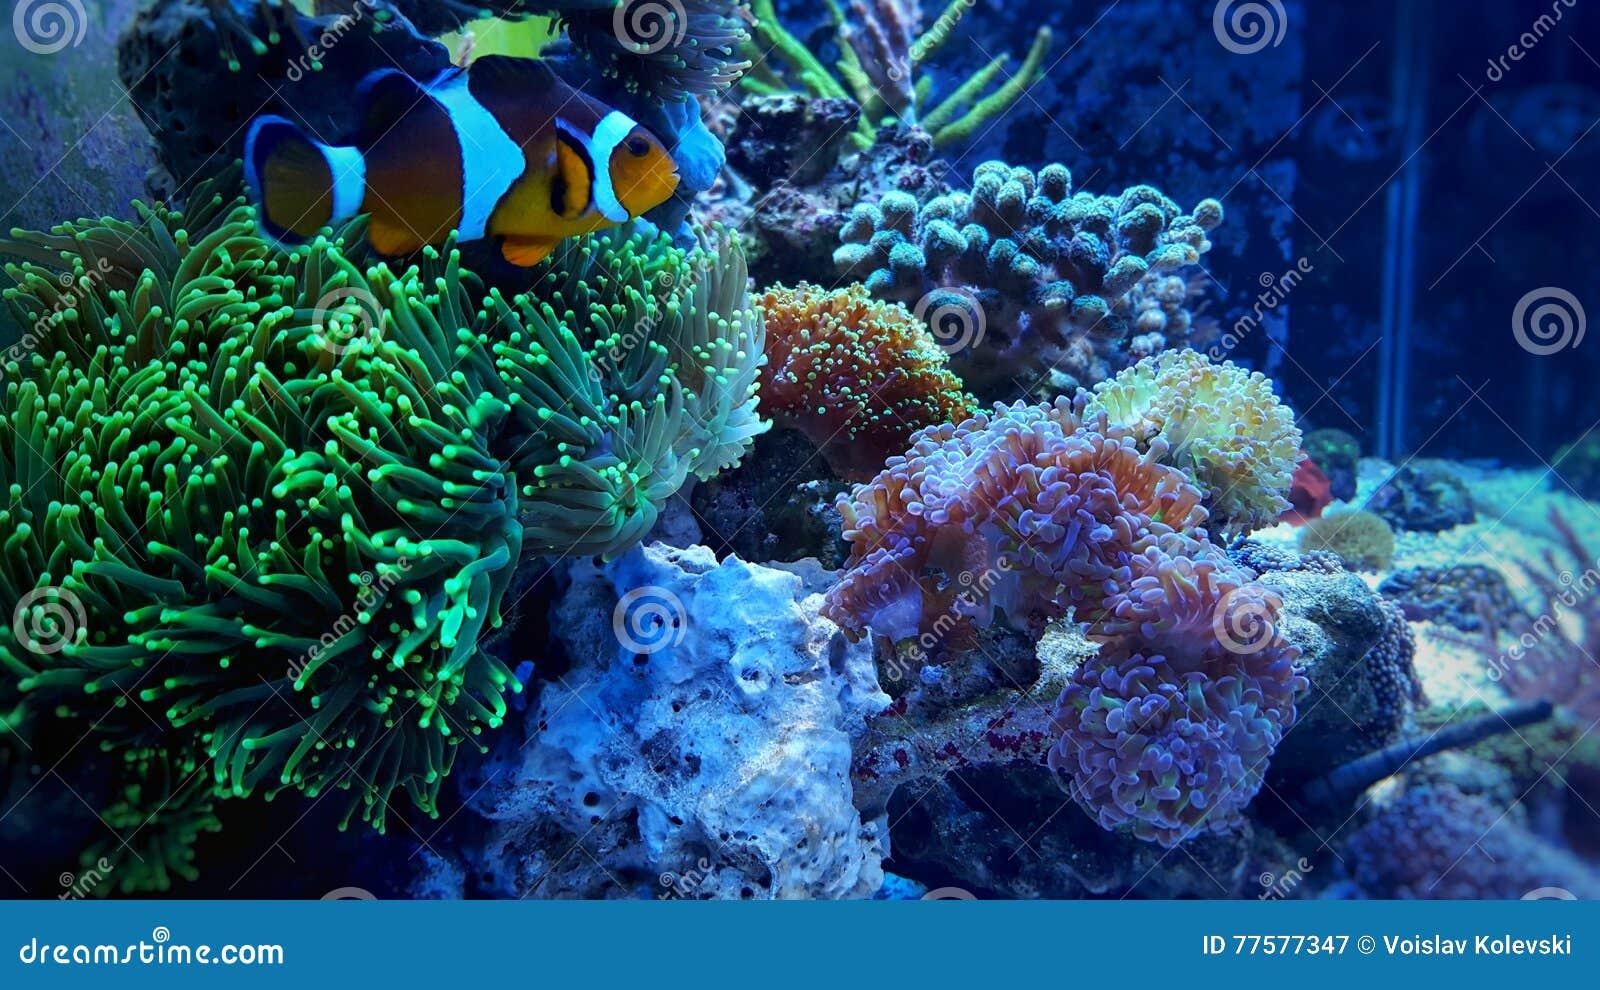 Clownfish nemo on green coral